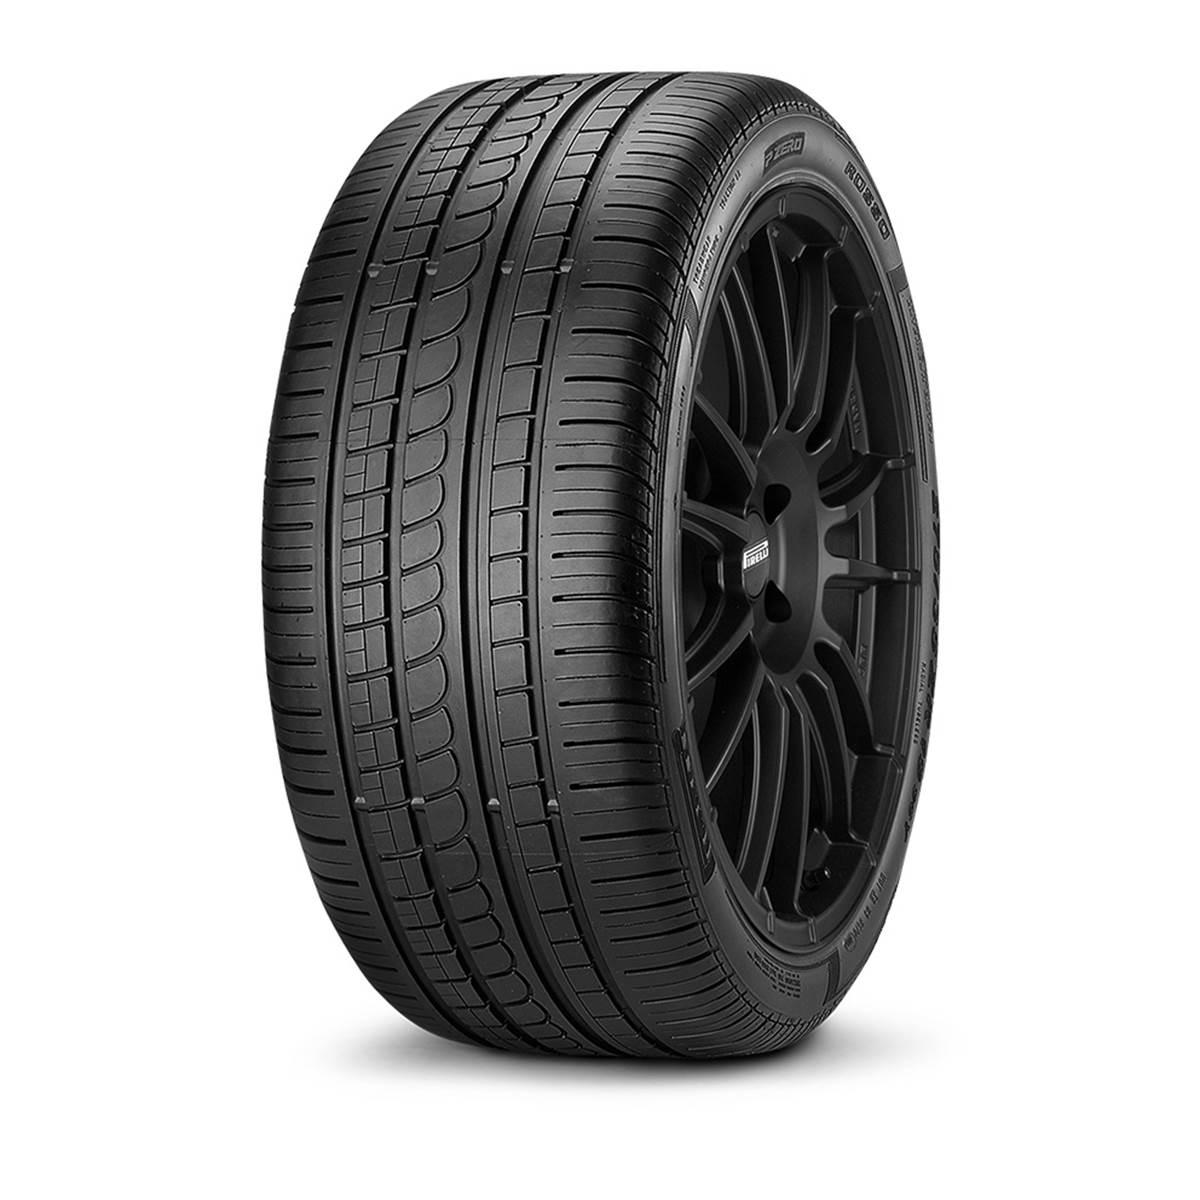 Pneu Pirelli 285/25R20 93Y Pzero Nero (Gt) XL